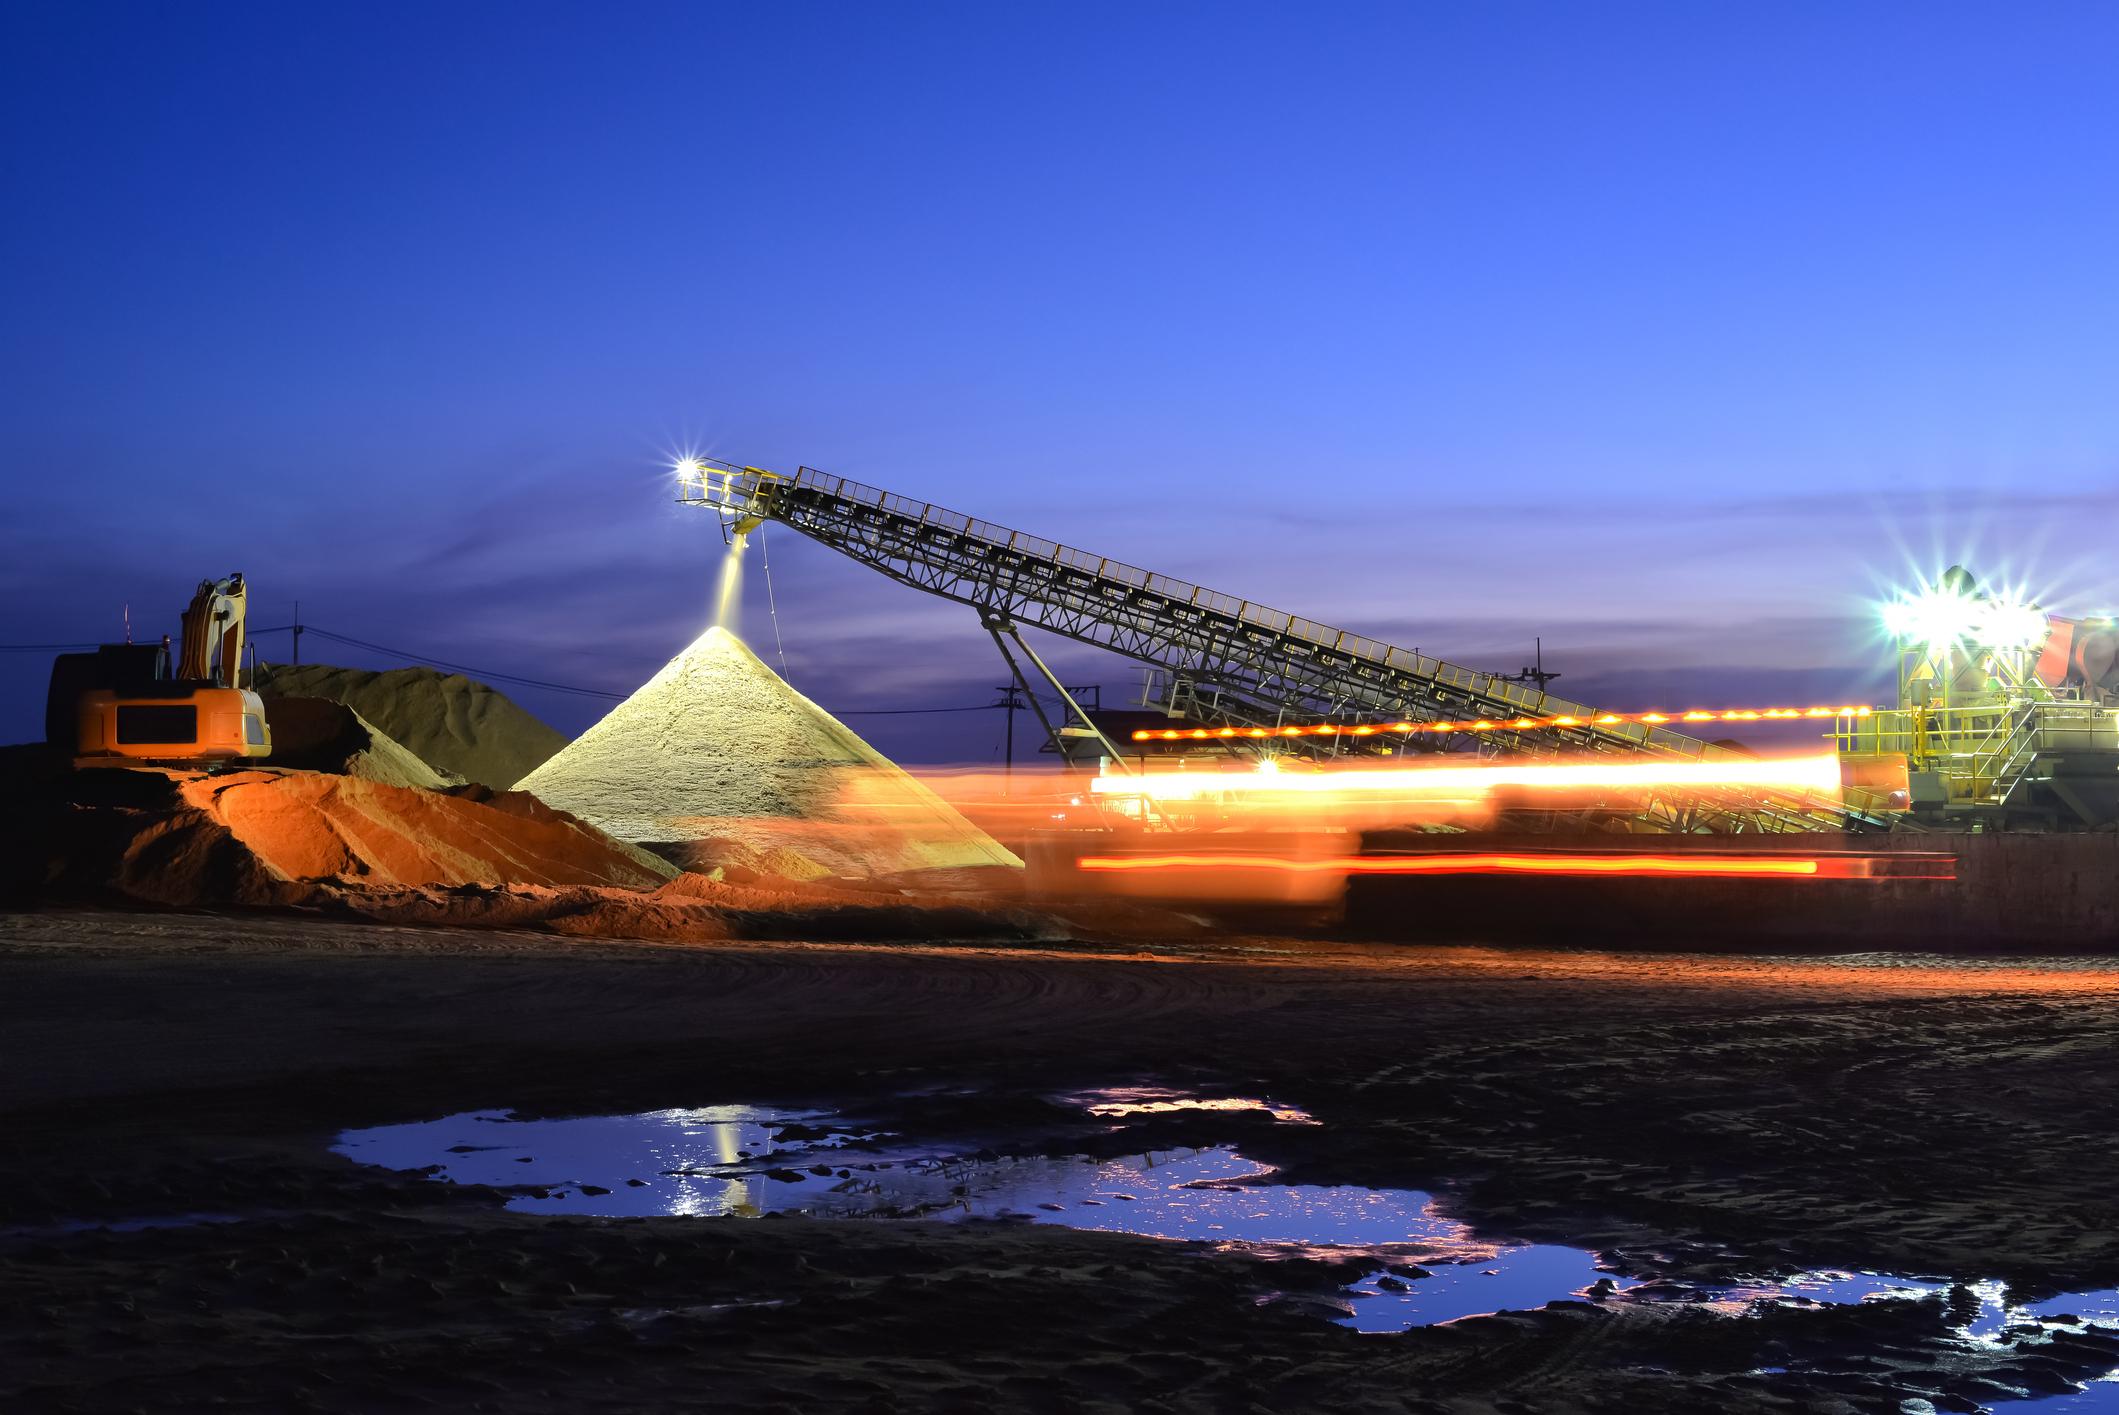 Sand mining at night.